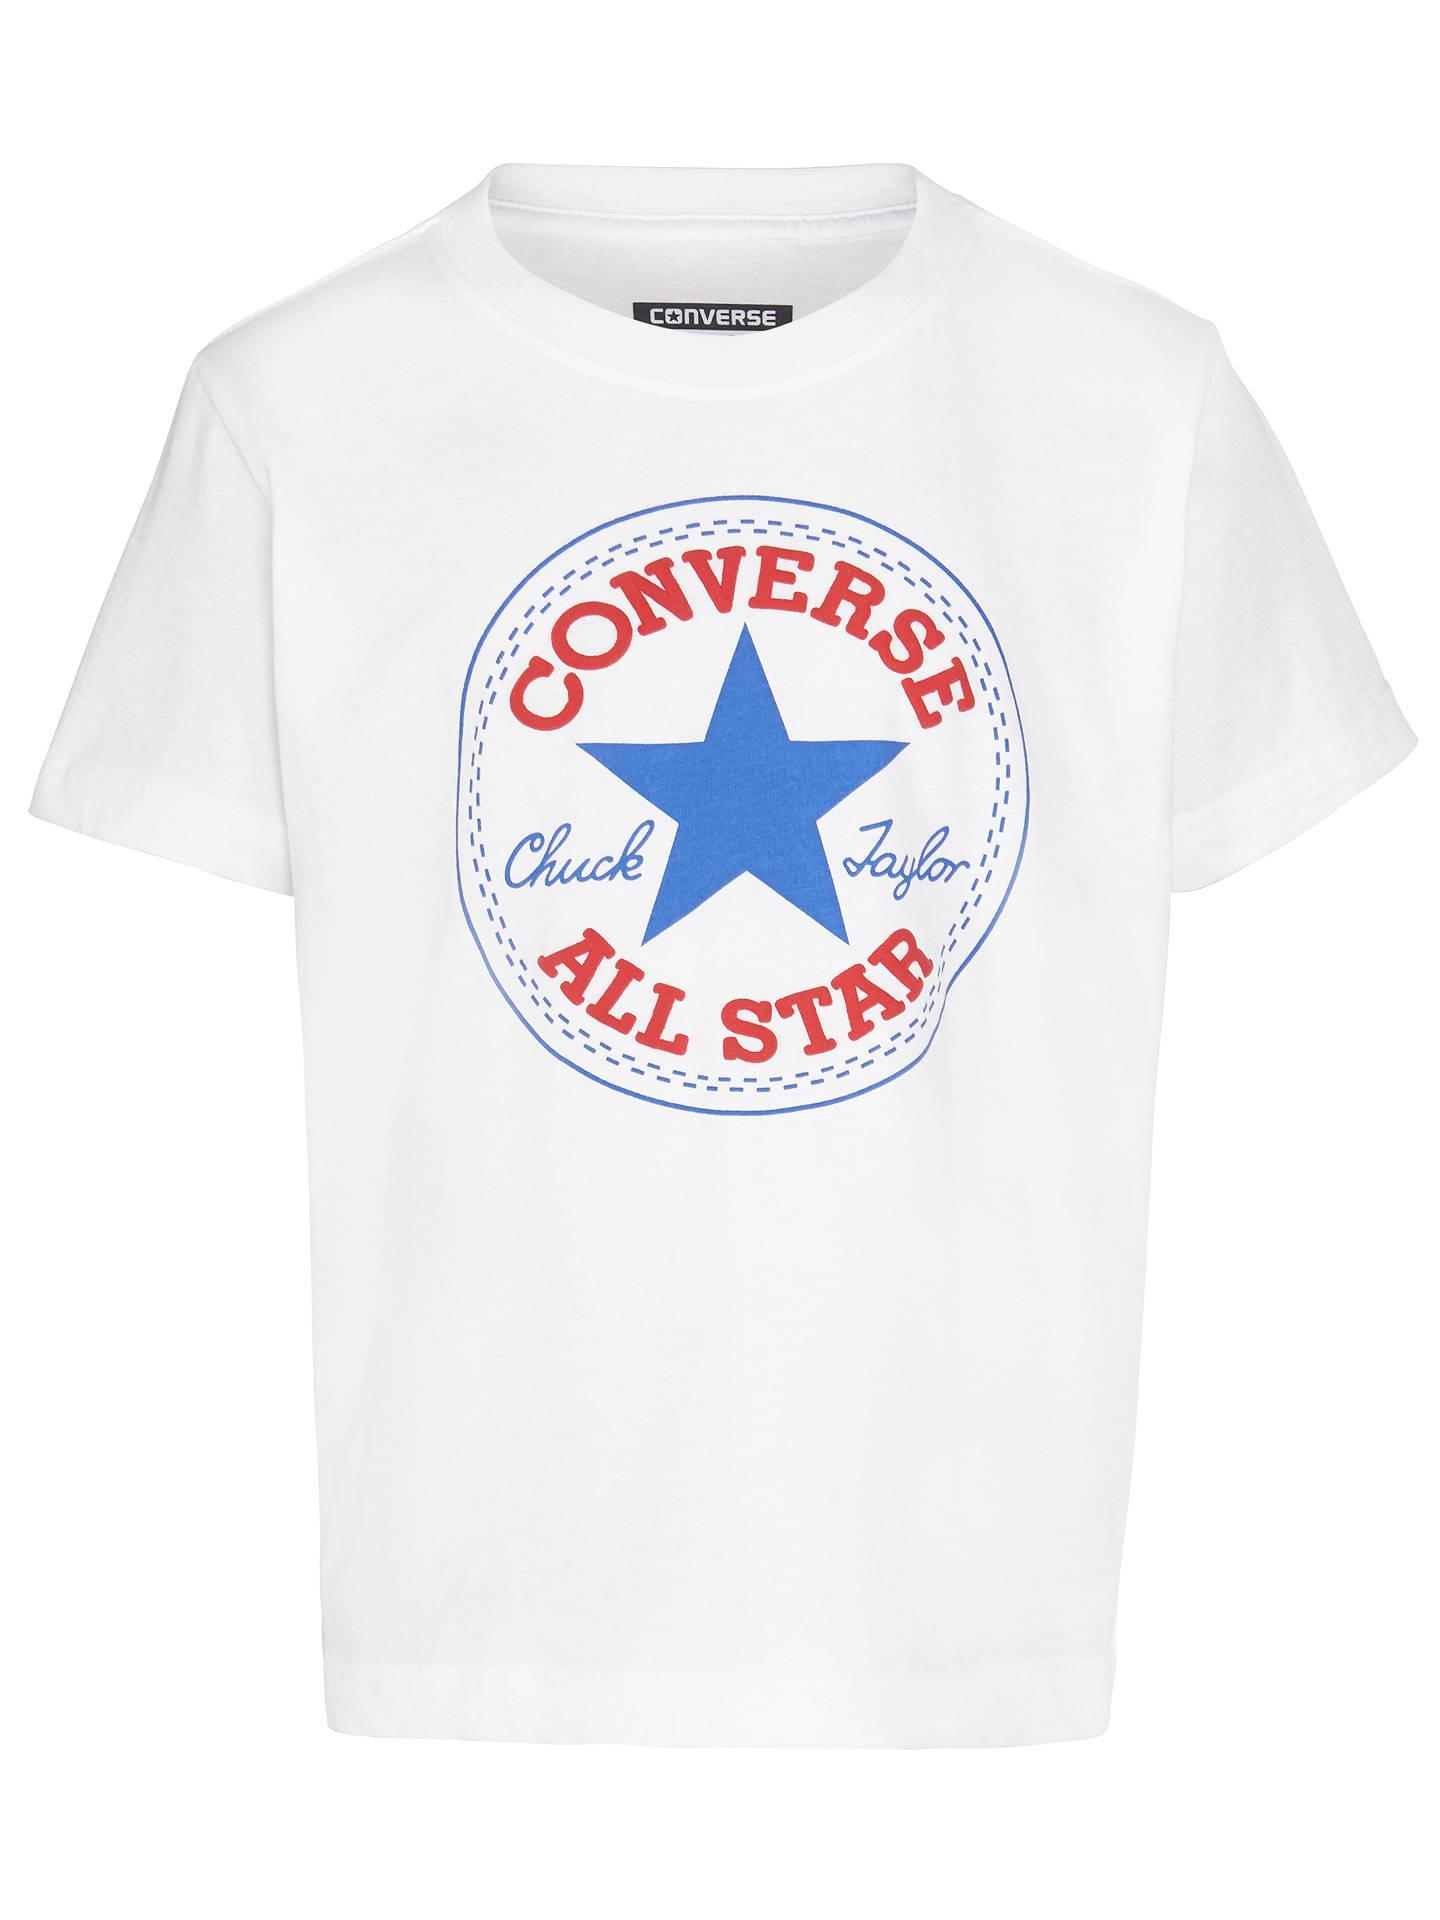 4a532773 Converse Boys' Chuck Patch T-Shirt, White at John Lewis & Partners